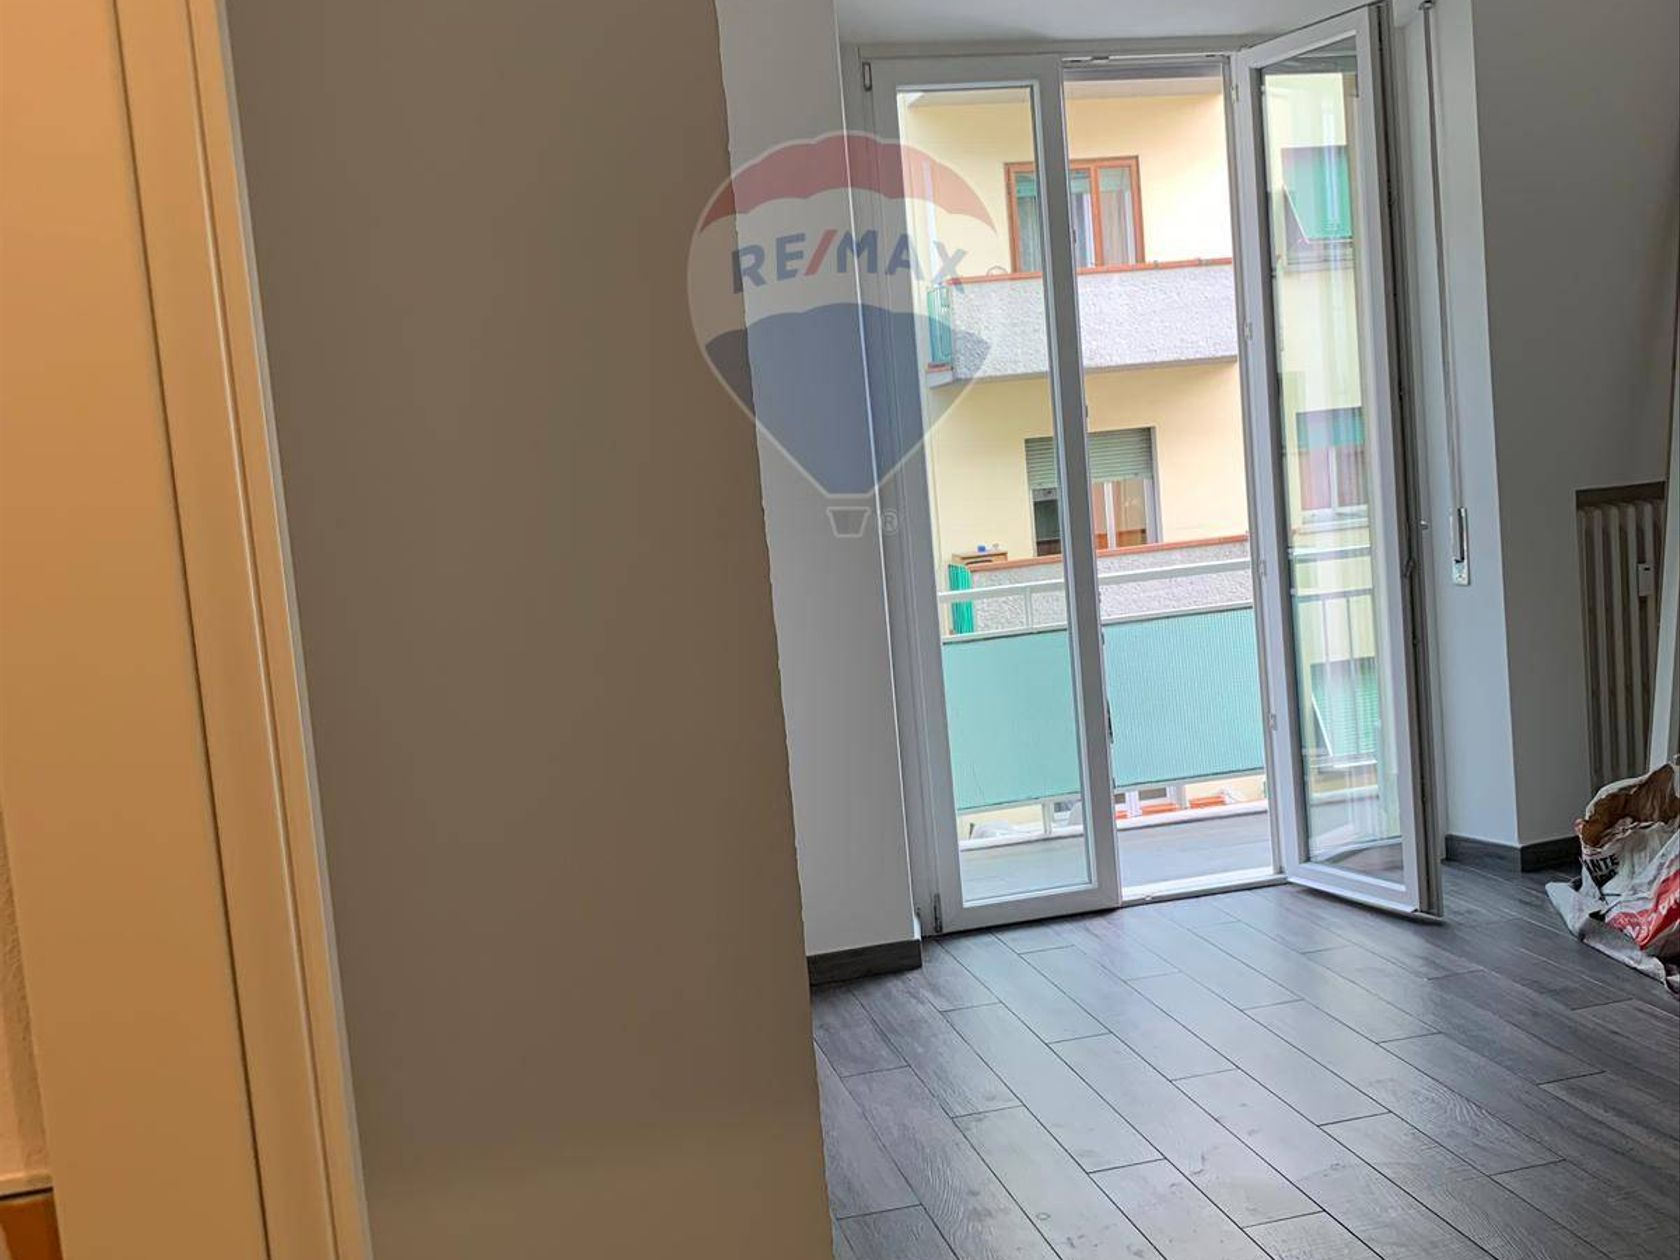 Appartamento San Iacopino, Firenze, FI Vendita - Foto 14